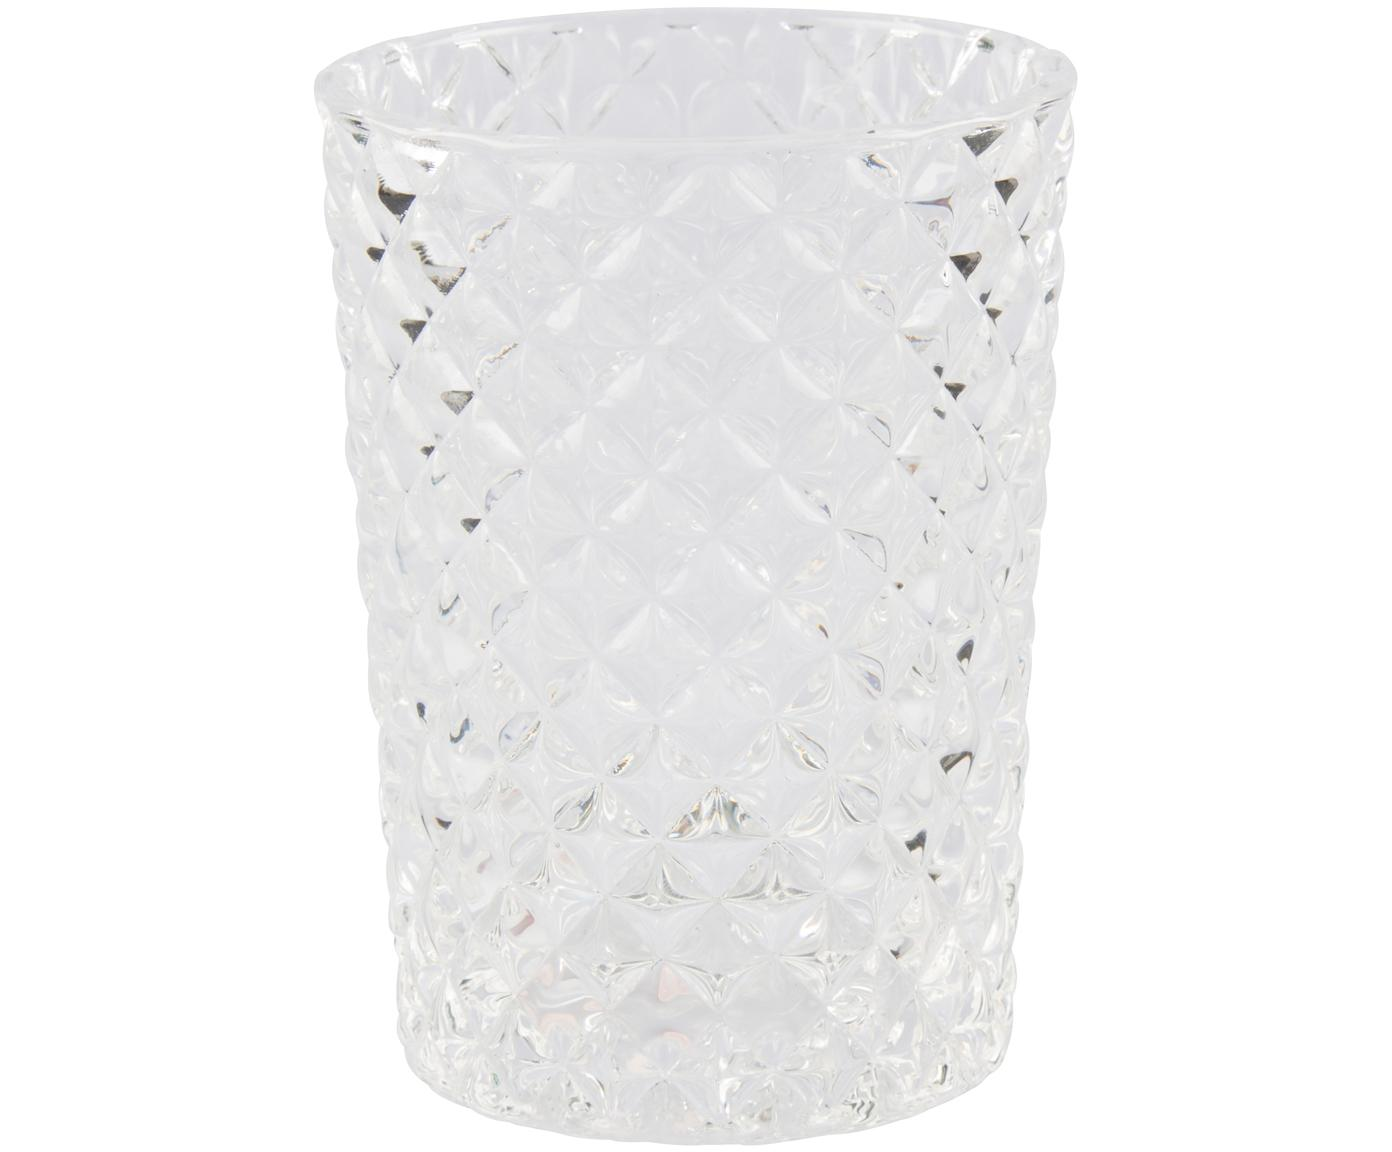 Glas-Zahnputzbecher Diamante, Glas, Transparent, Ø 7 x H 10 cm